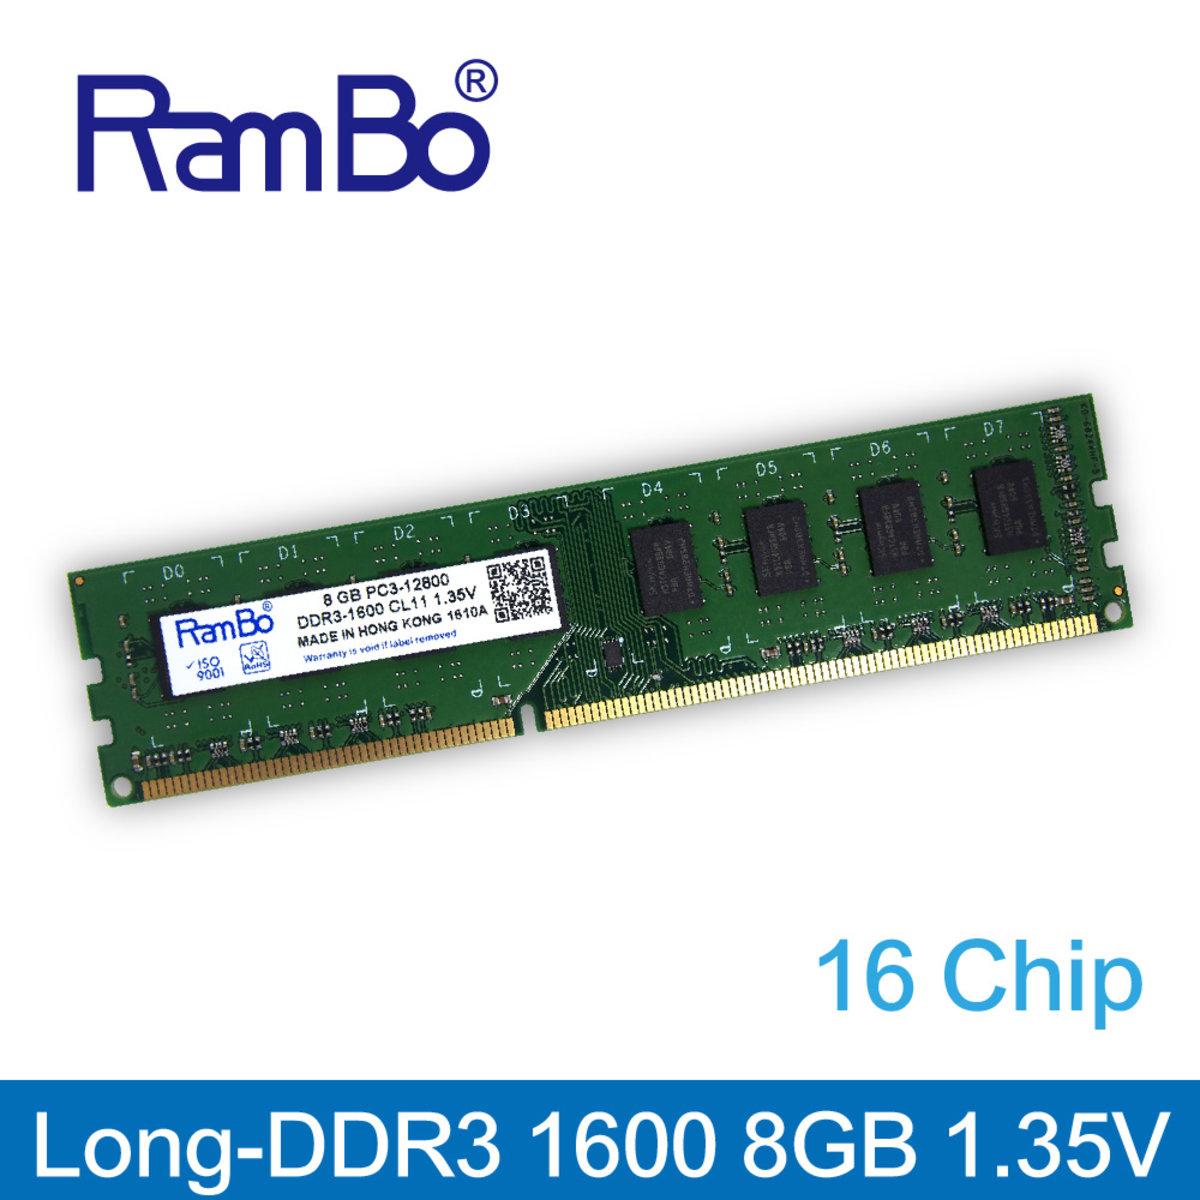 8GB DDR3 1600MHz Long DIMM 16-Chip 1.35V Memory for PC Desktop